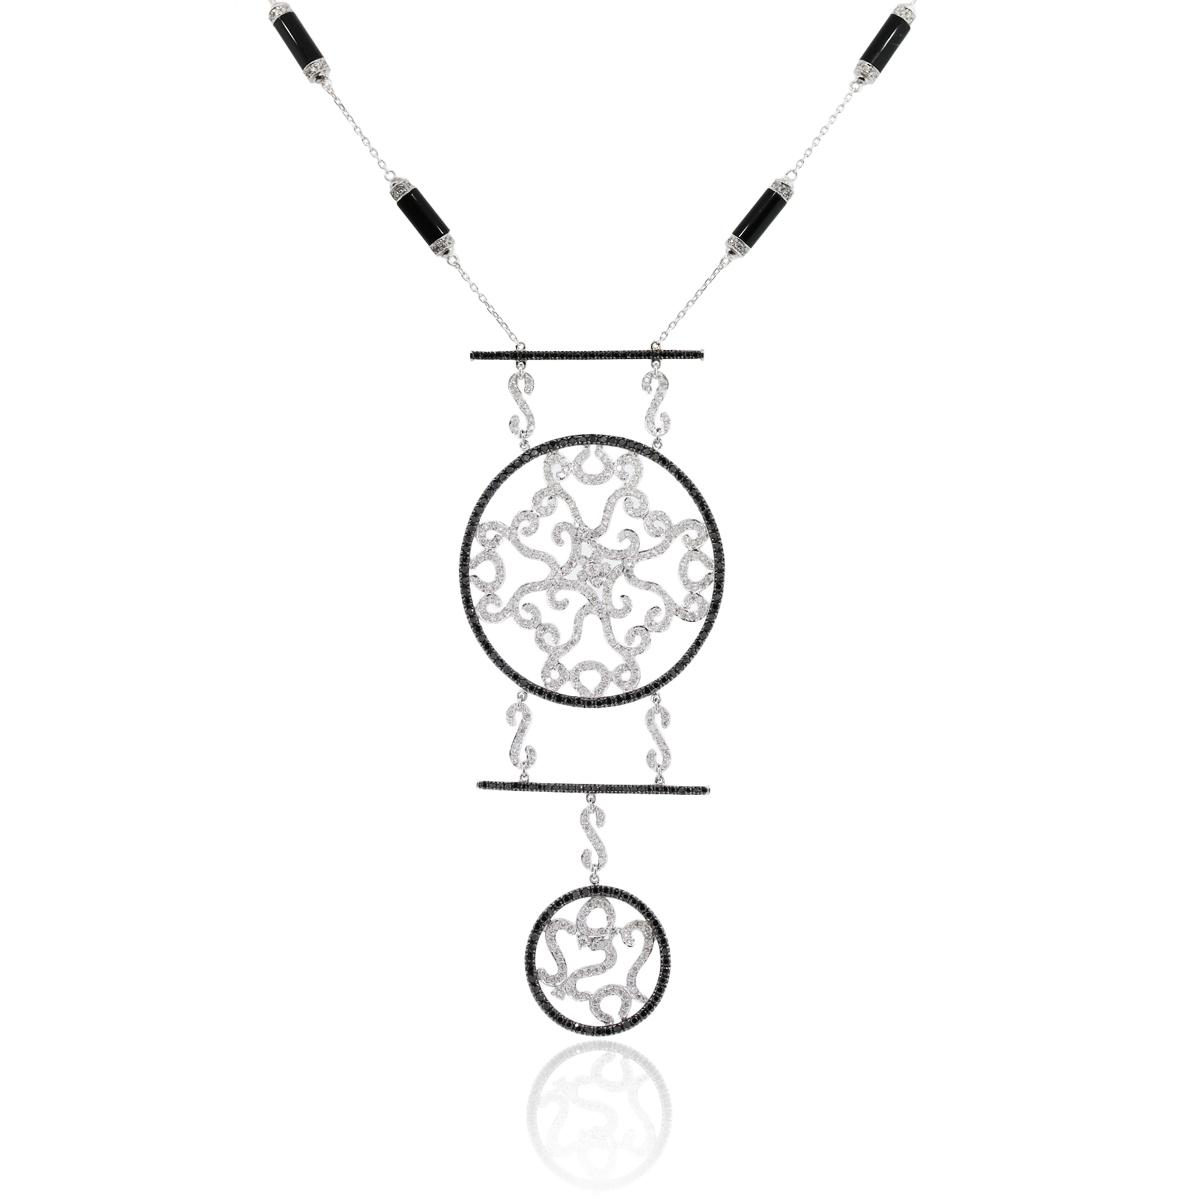 14k White Gold 5.98ctw Medallion Diamond Necklace